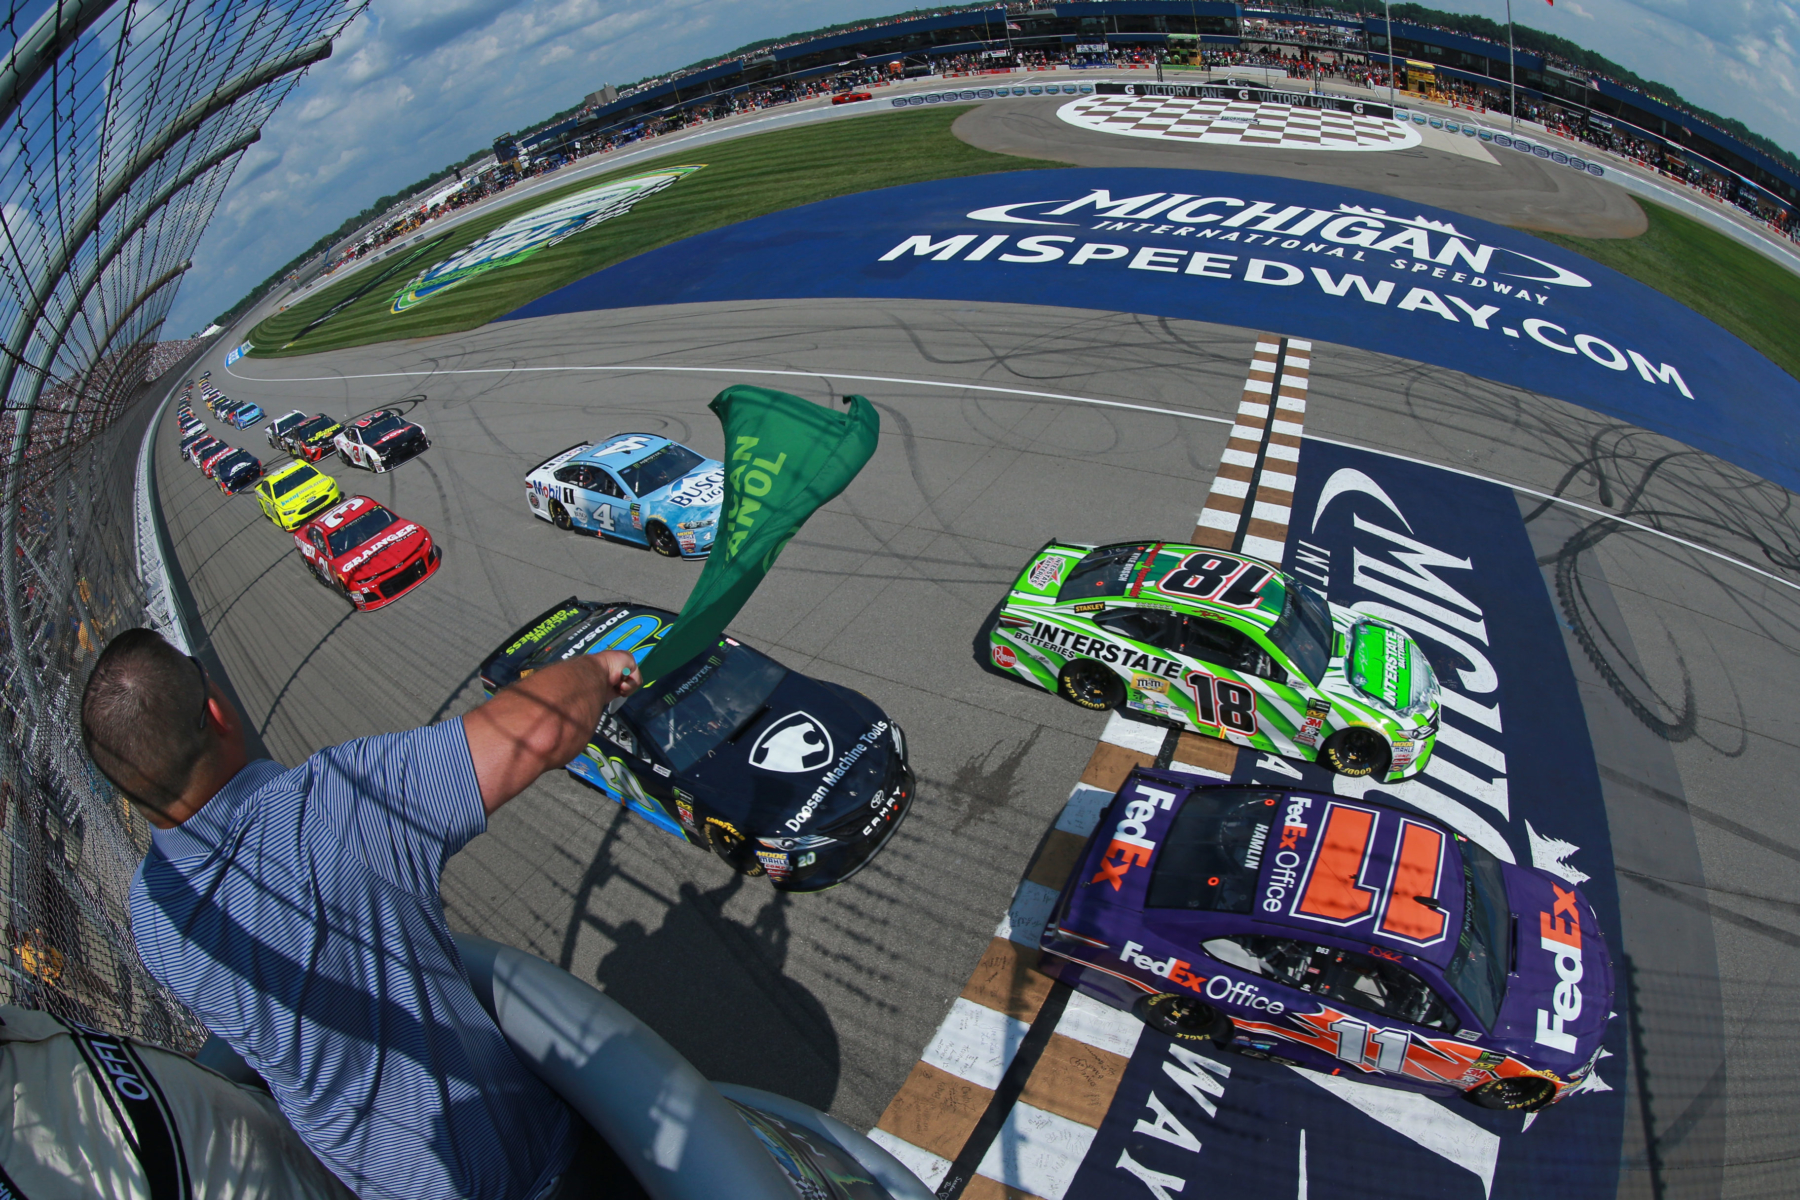 NASCAR Cup Series at Michigan International Speedway